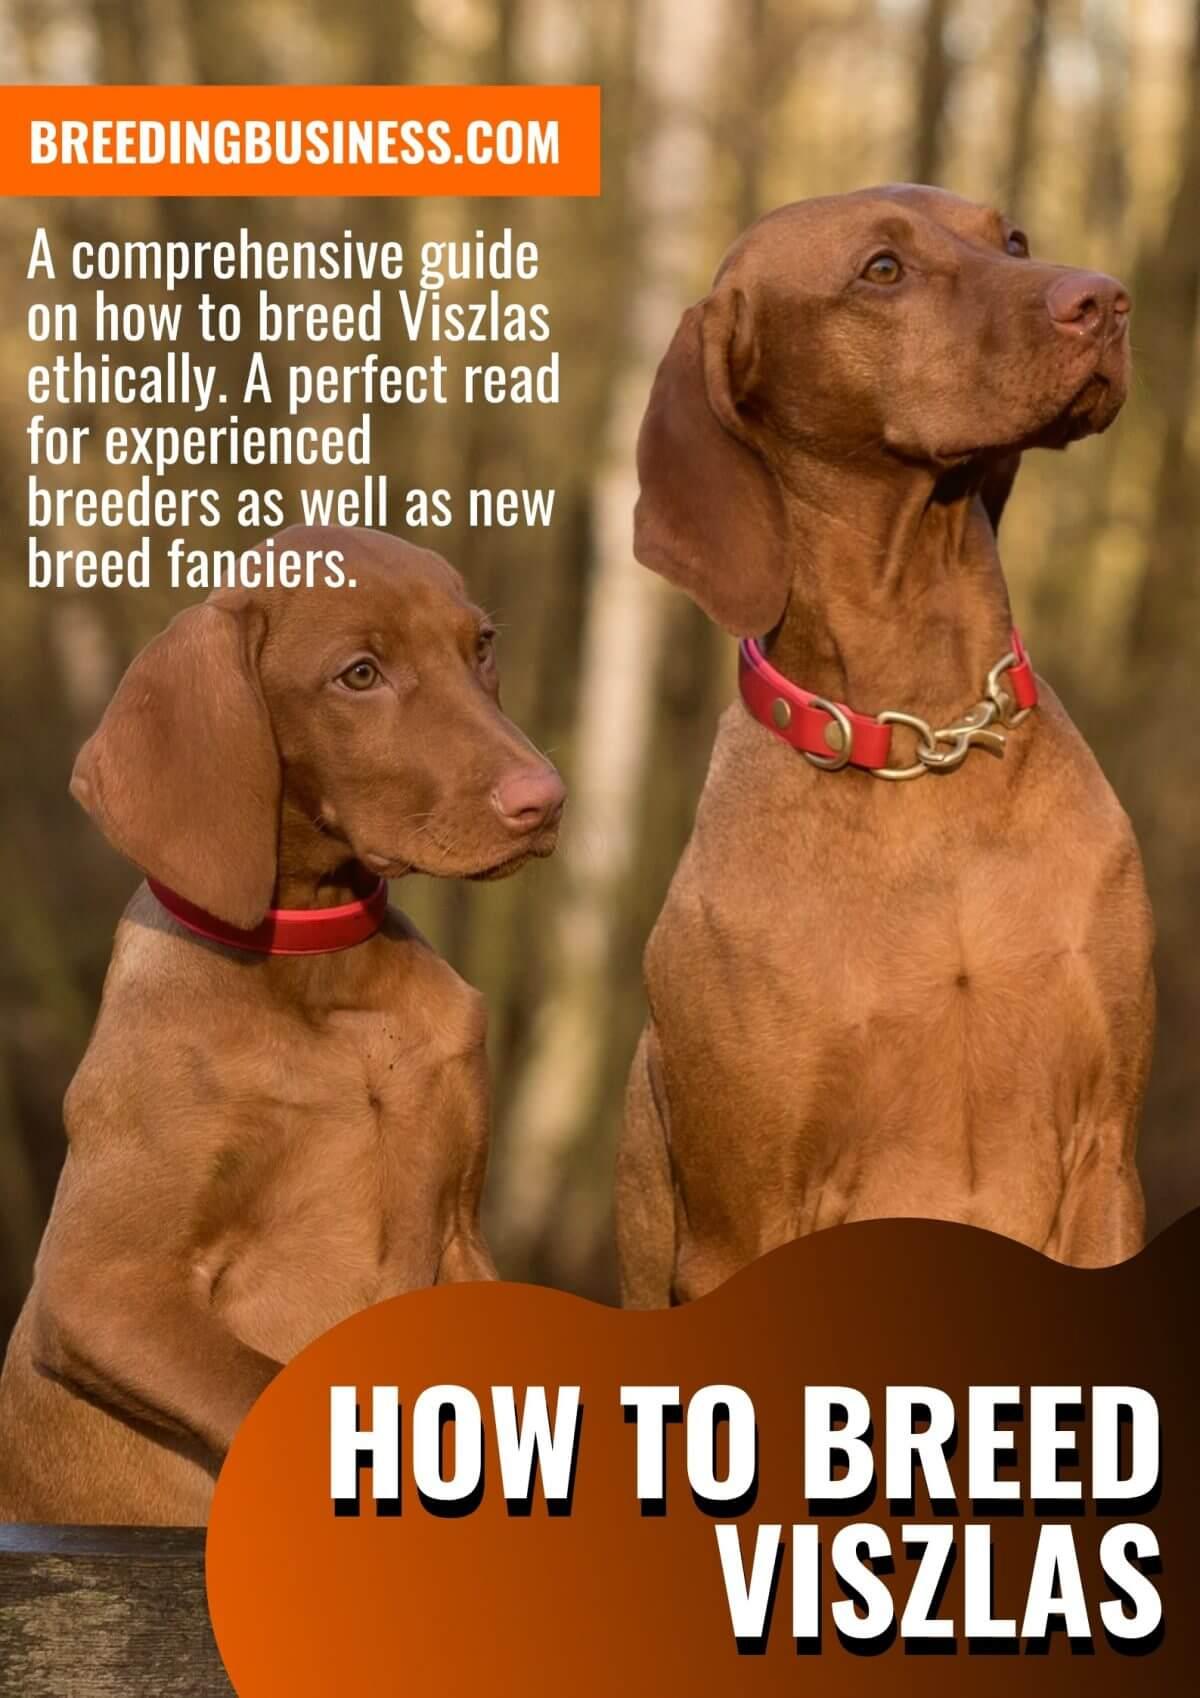 breeding vizslas (guide)